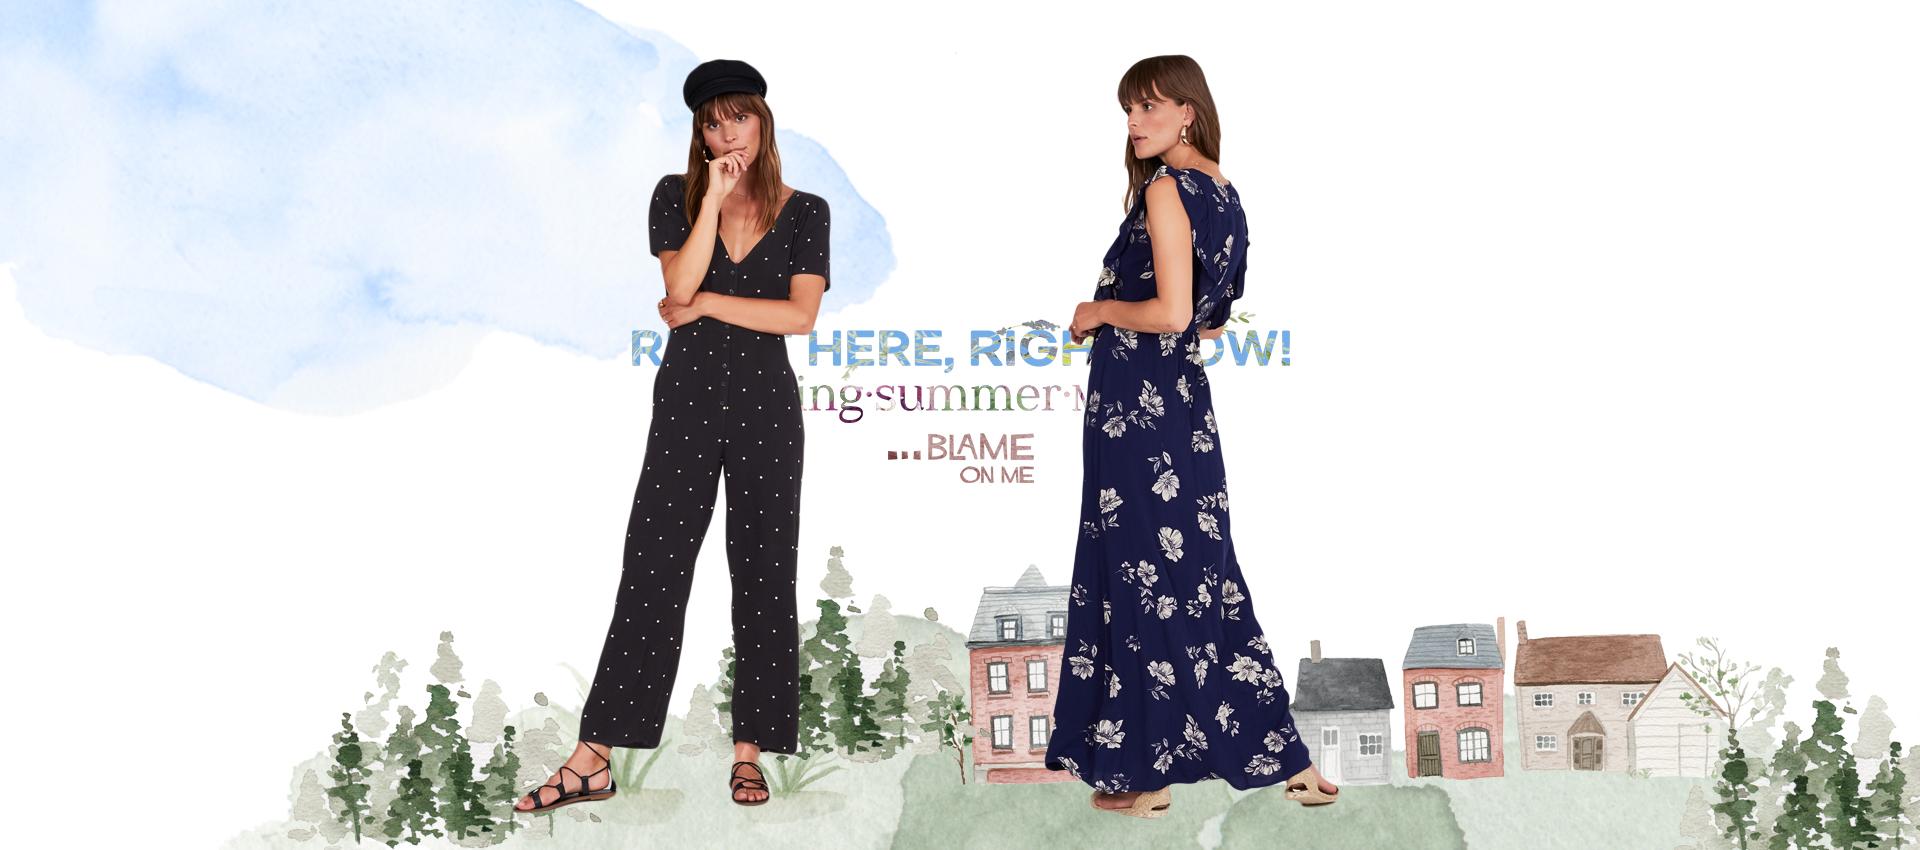 blame-spring-summer-2019-006